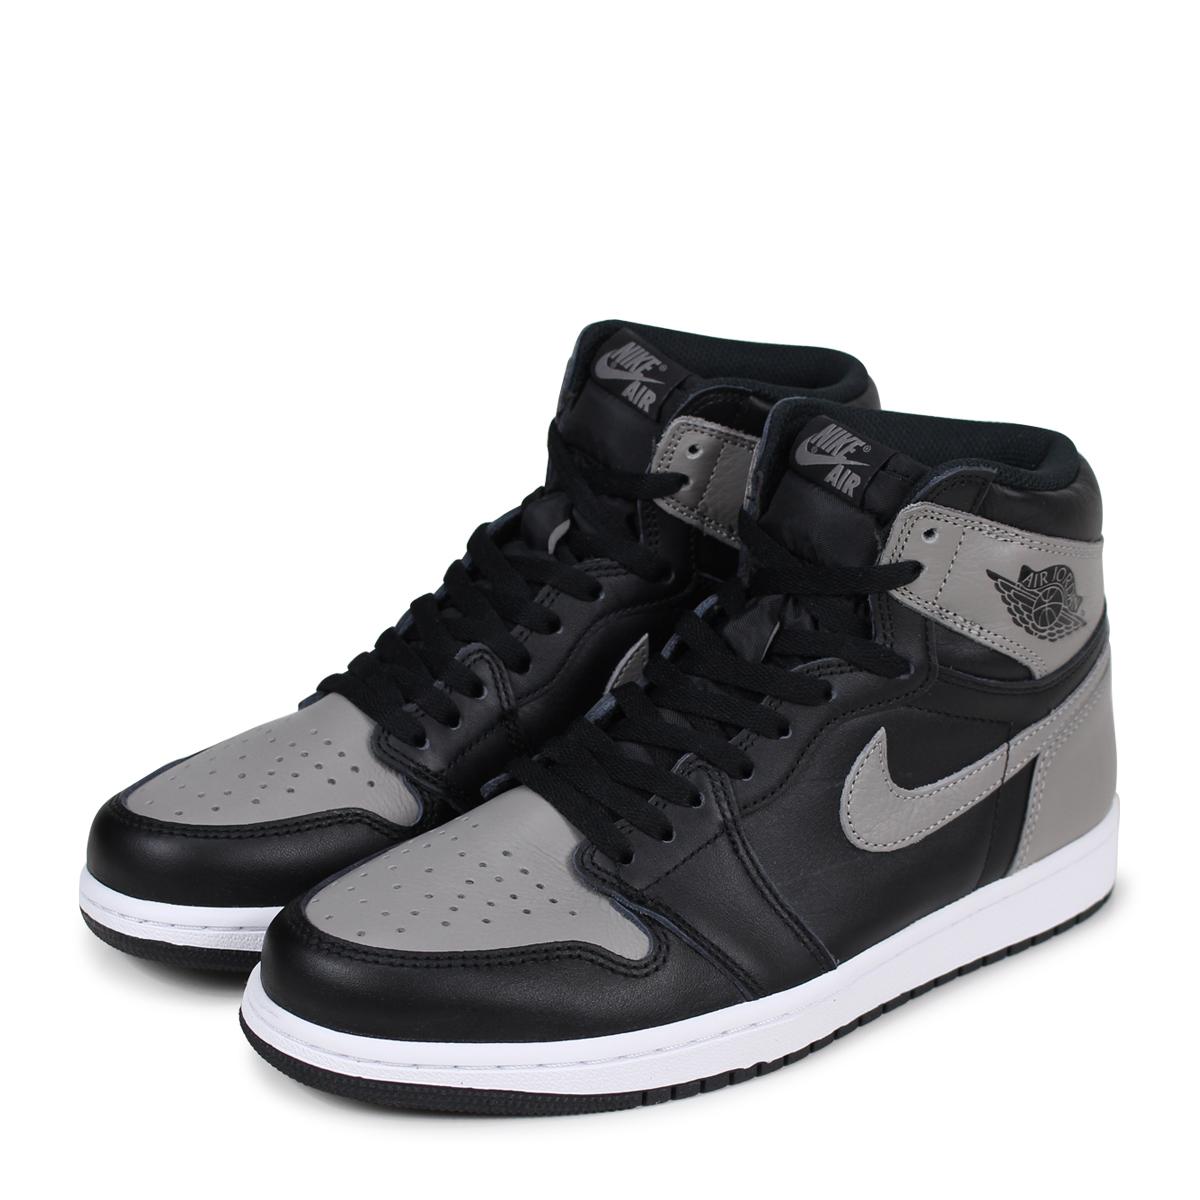 a13d084b60e NIKE AIR JORDAN 1 RETRO HIGH OG SHADOW Nike Air Jordan 1 nostalgic high  sneakers men ...